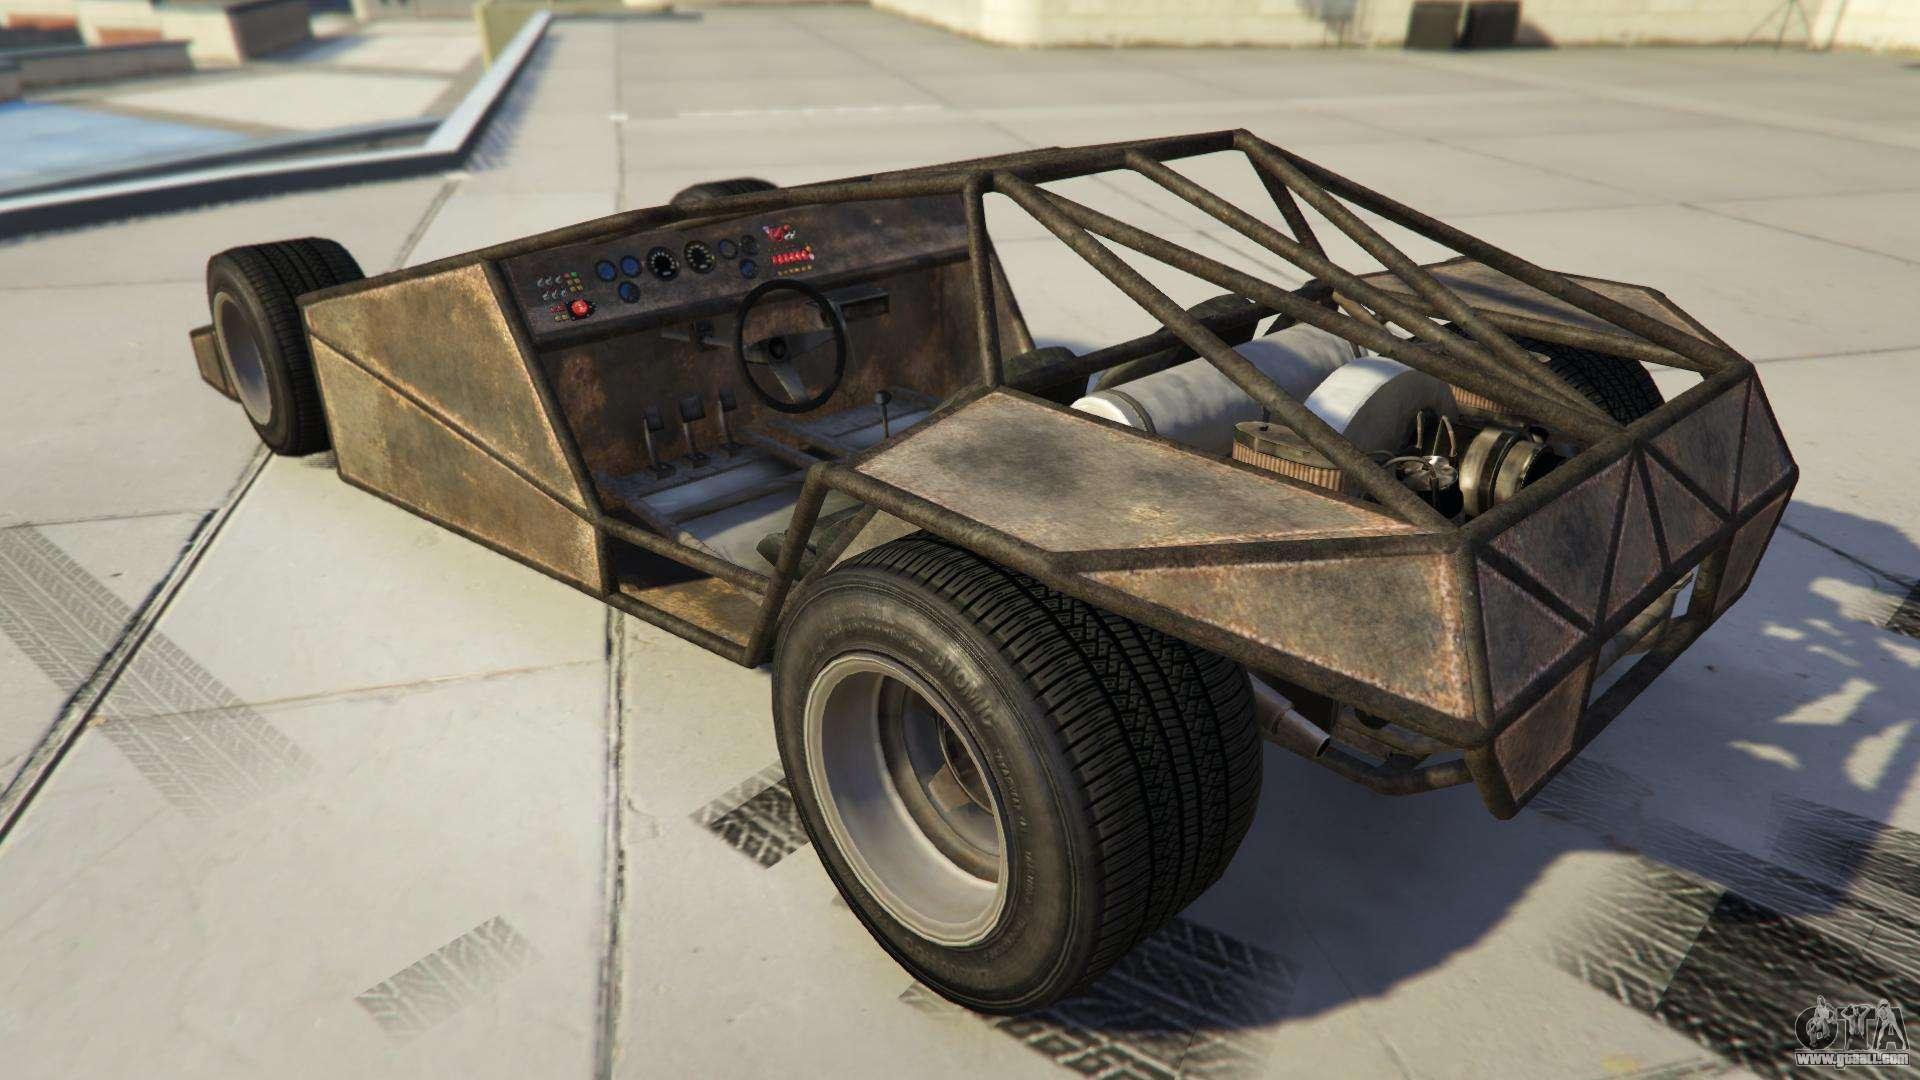 BF Ramp Buggy GTA Online - characteristics, description and screenshots